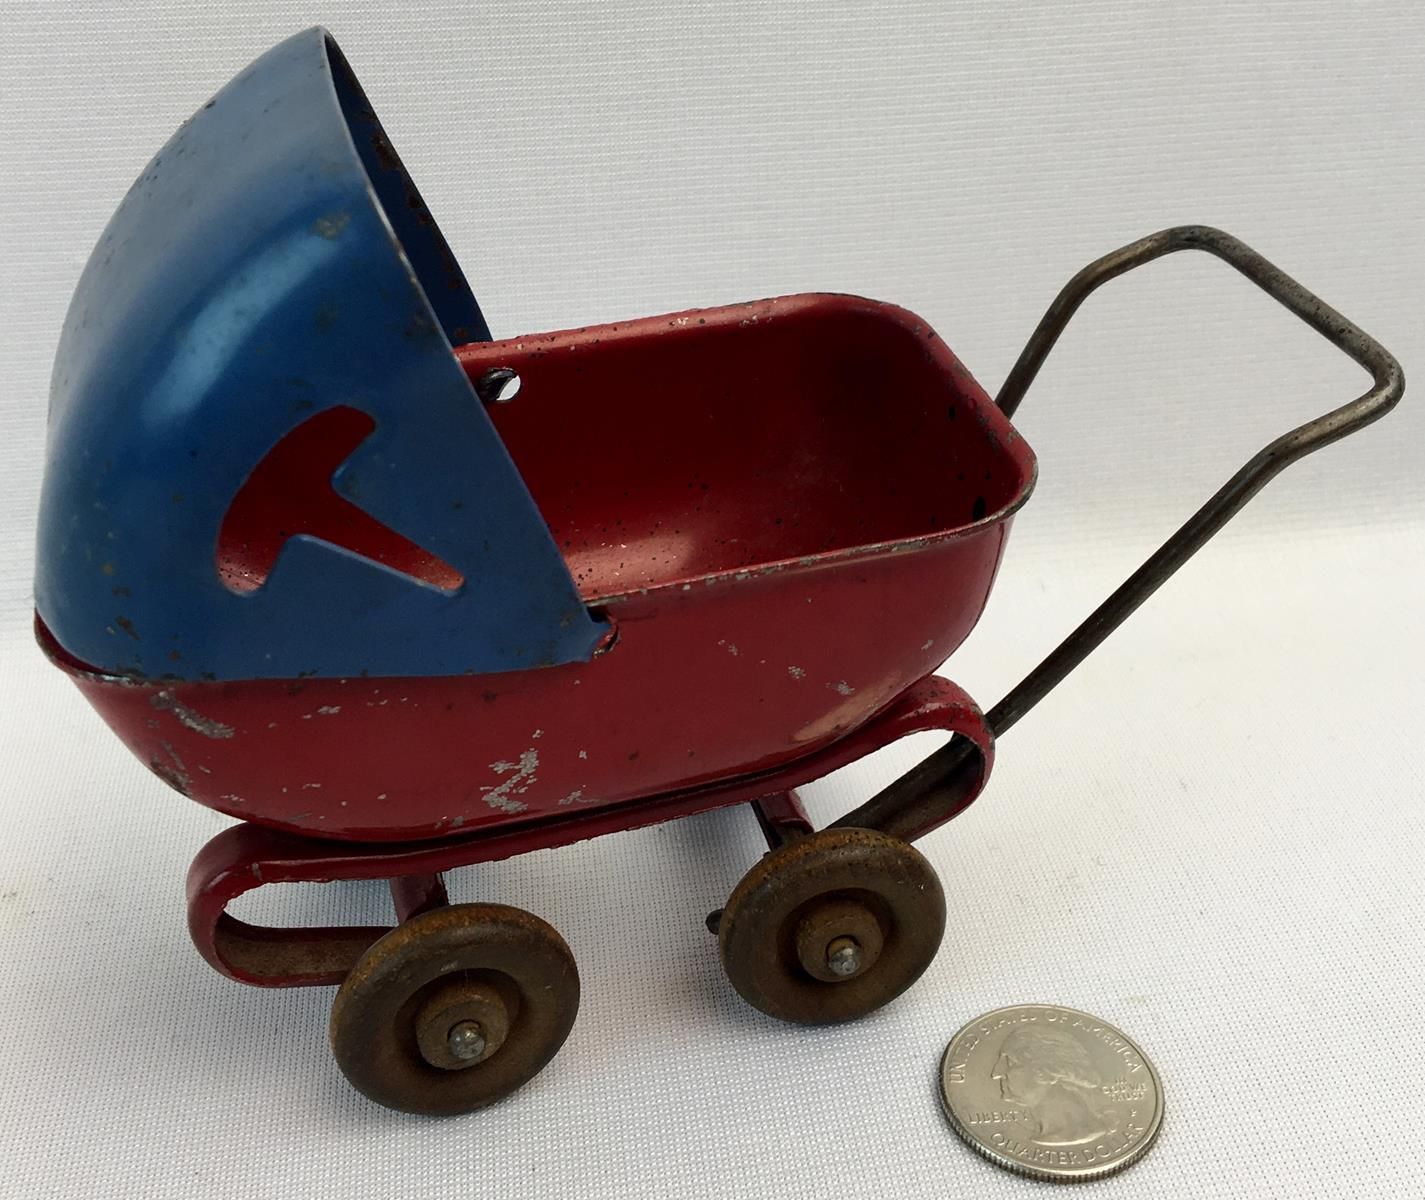 Vintage 1930's Wyandotte Metal Toy Baby Carriage w/ Wood Wheels